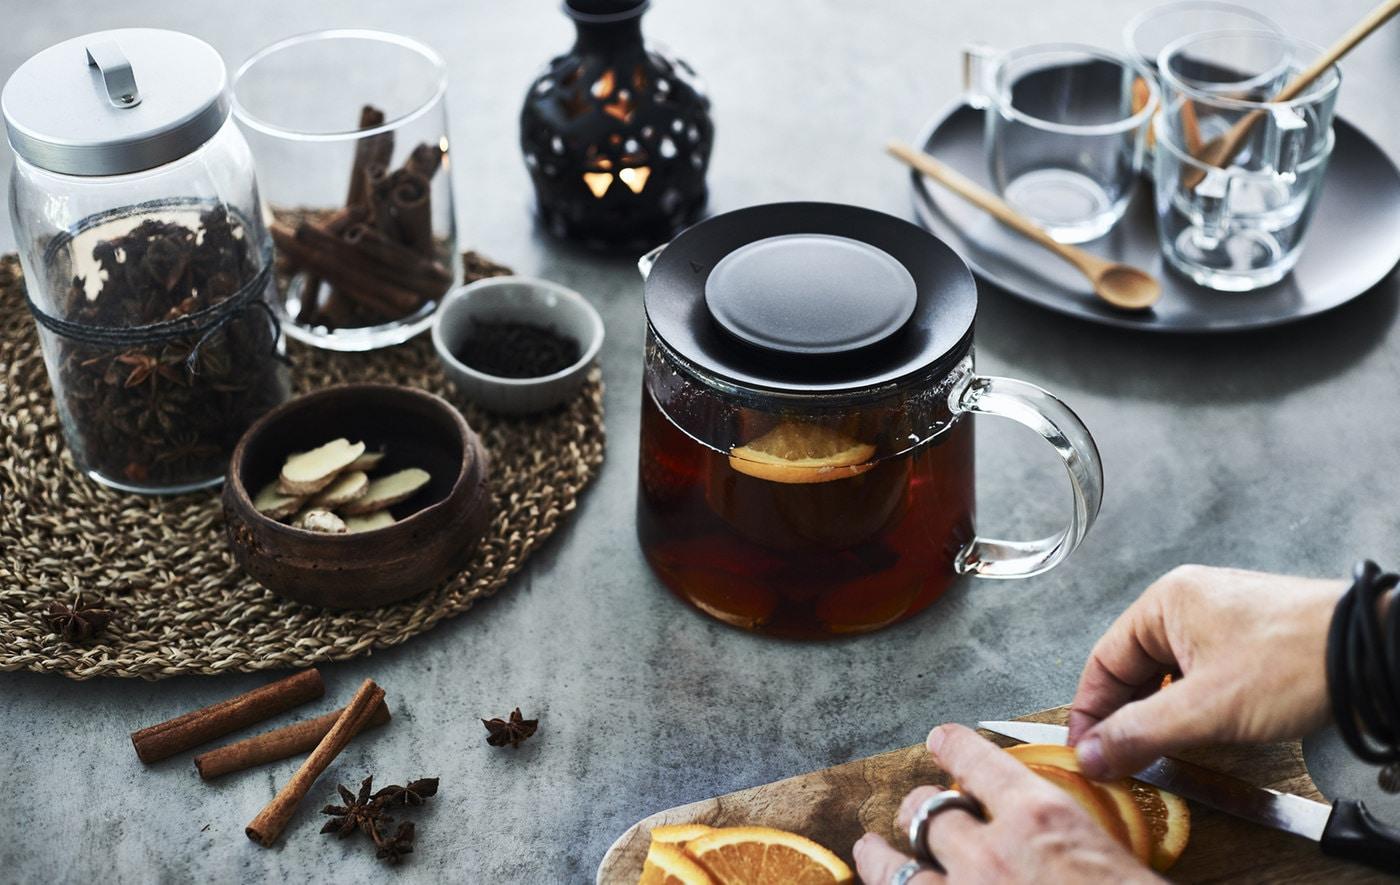 Home visit: brew a warming festive tea